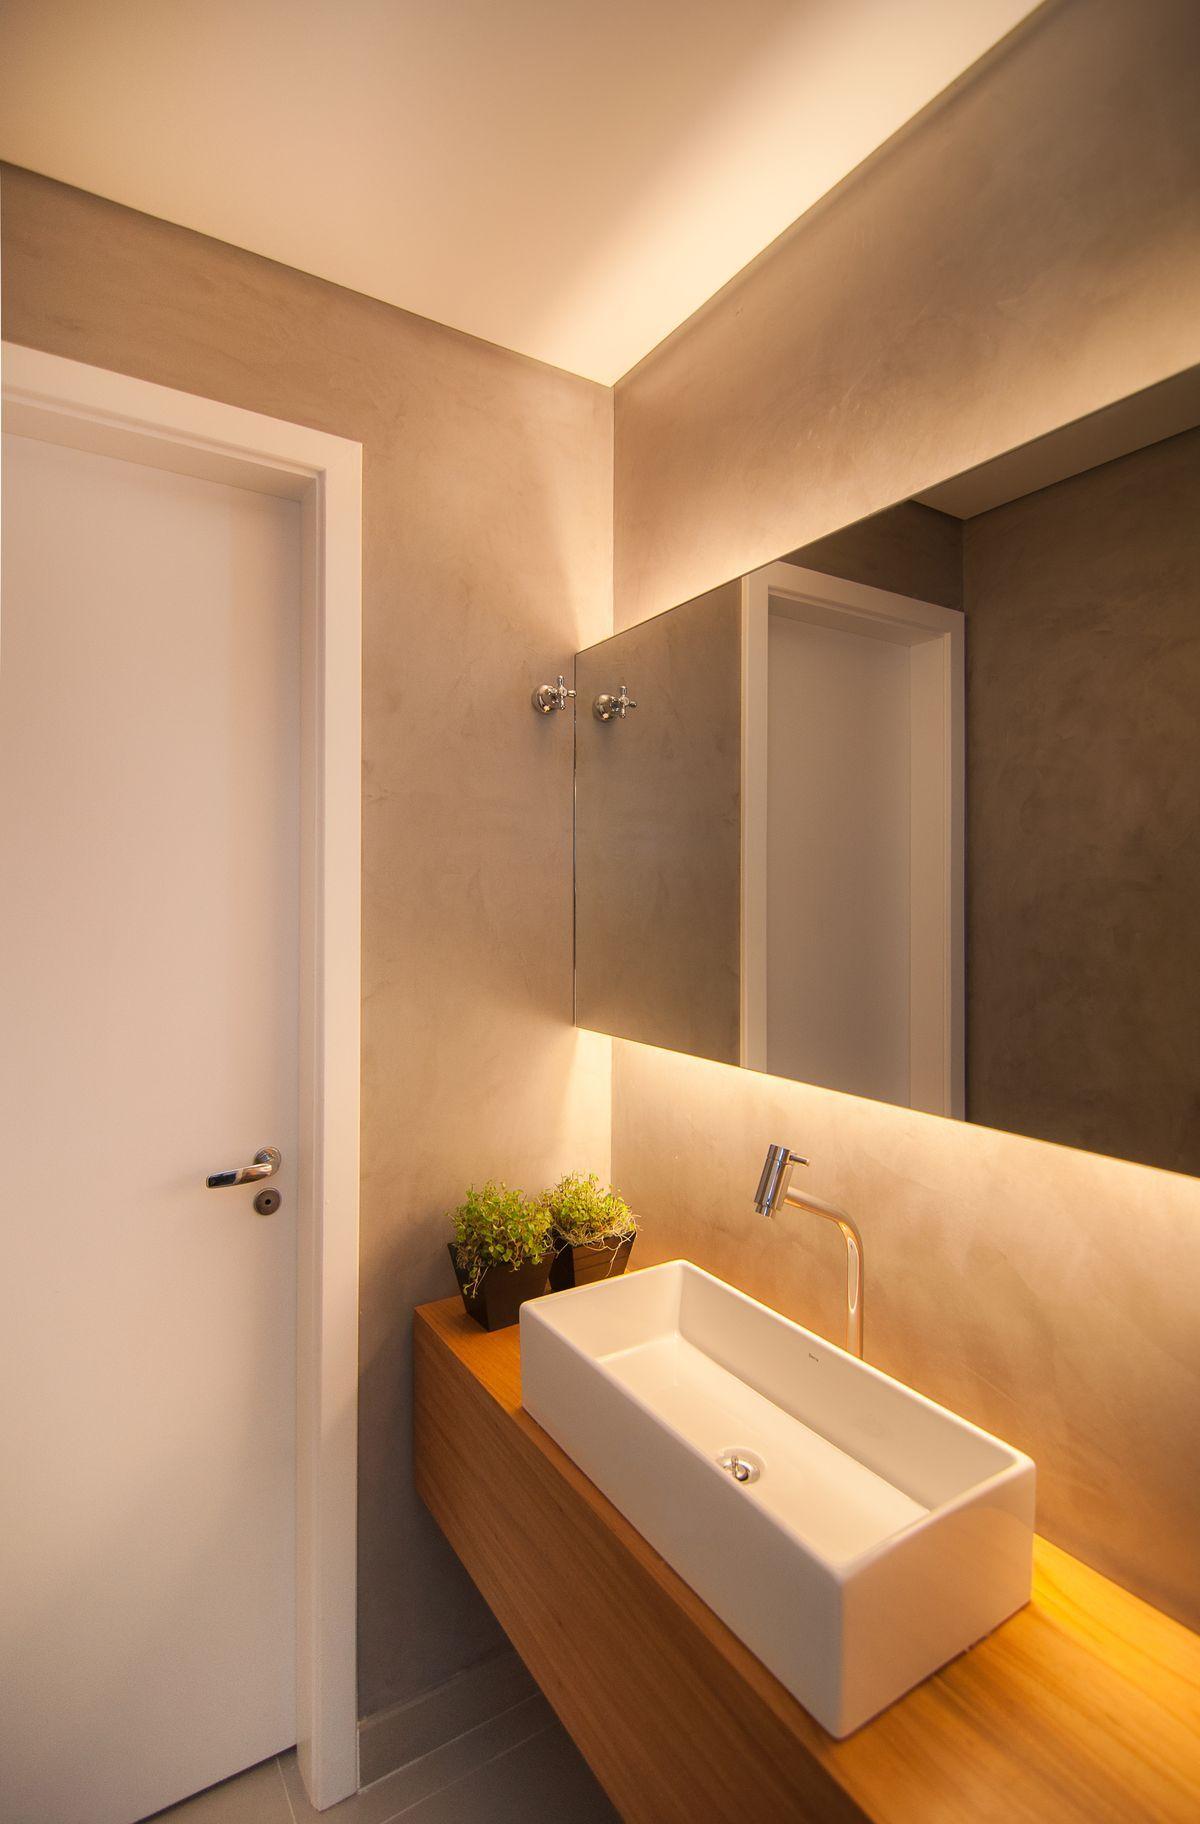 Pin by lizbet amalia on baÑos pinterest small bathroom bath and